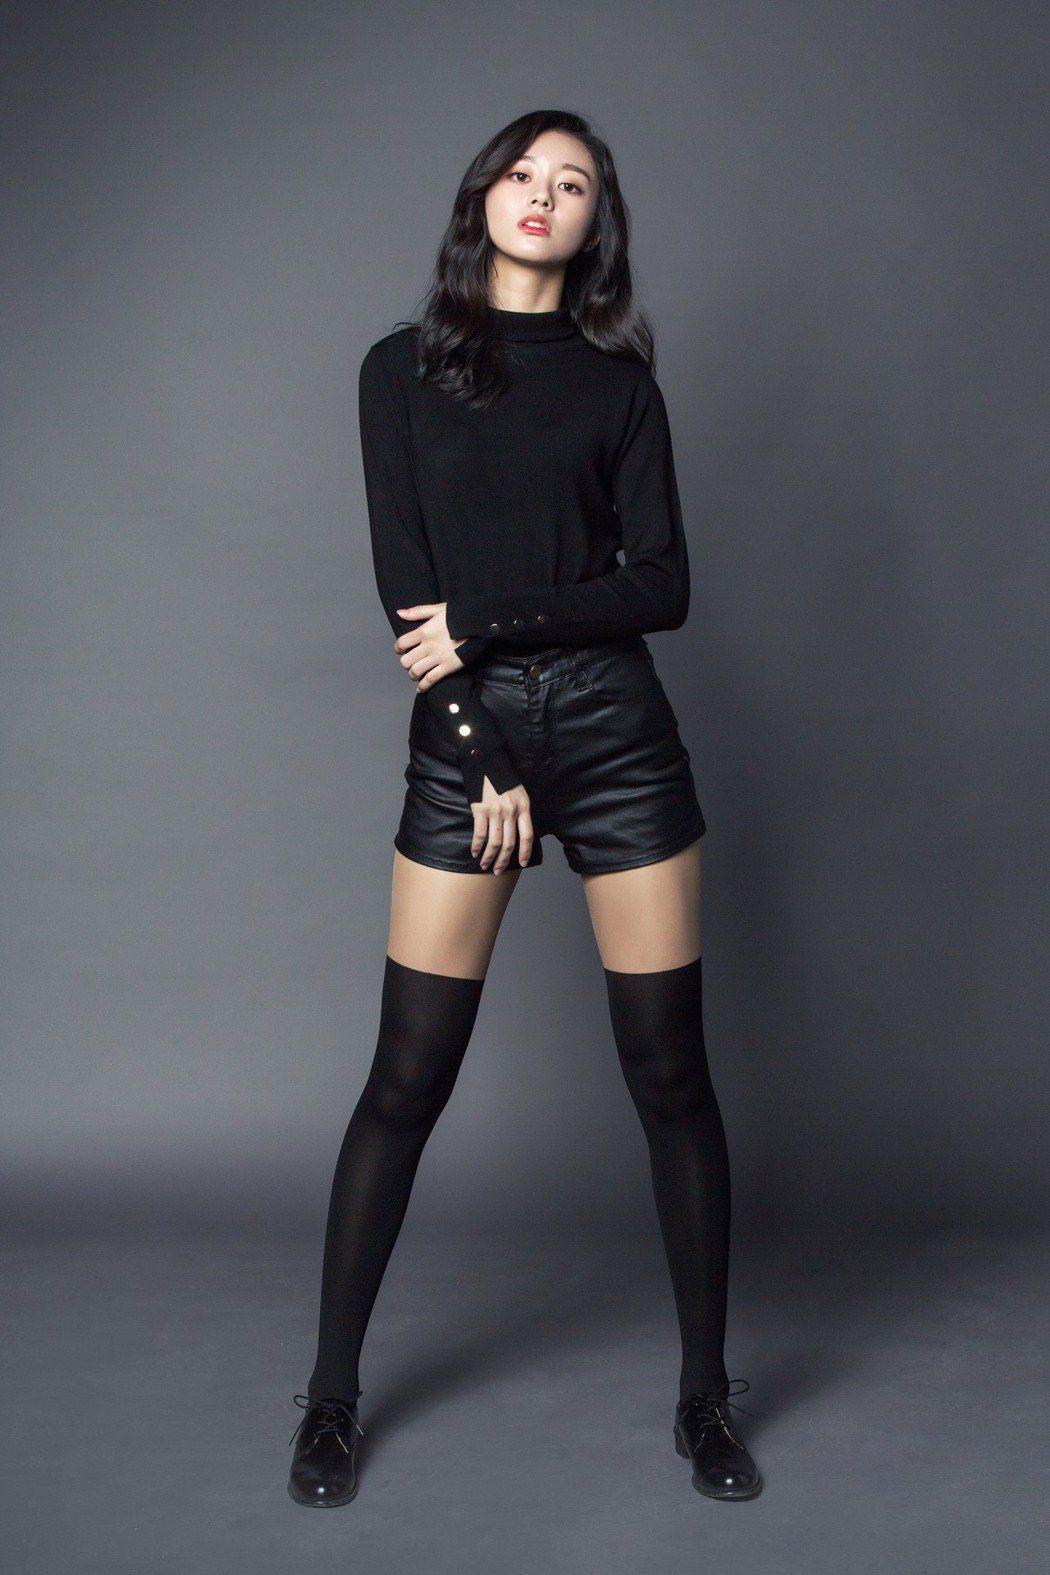 18歲台灣女孩Joanne(王乃萱)。圖/Uplive提供